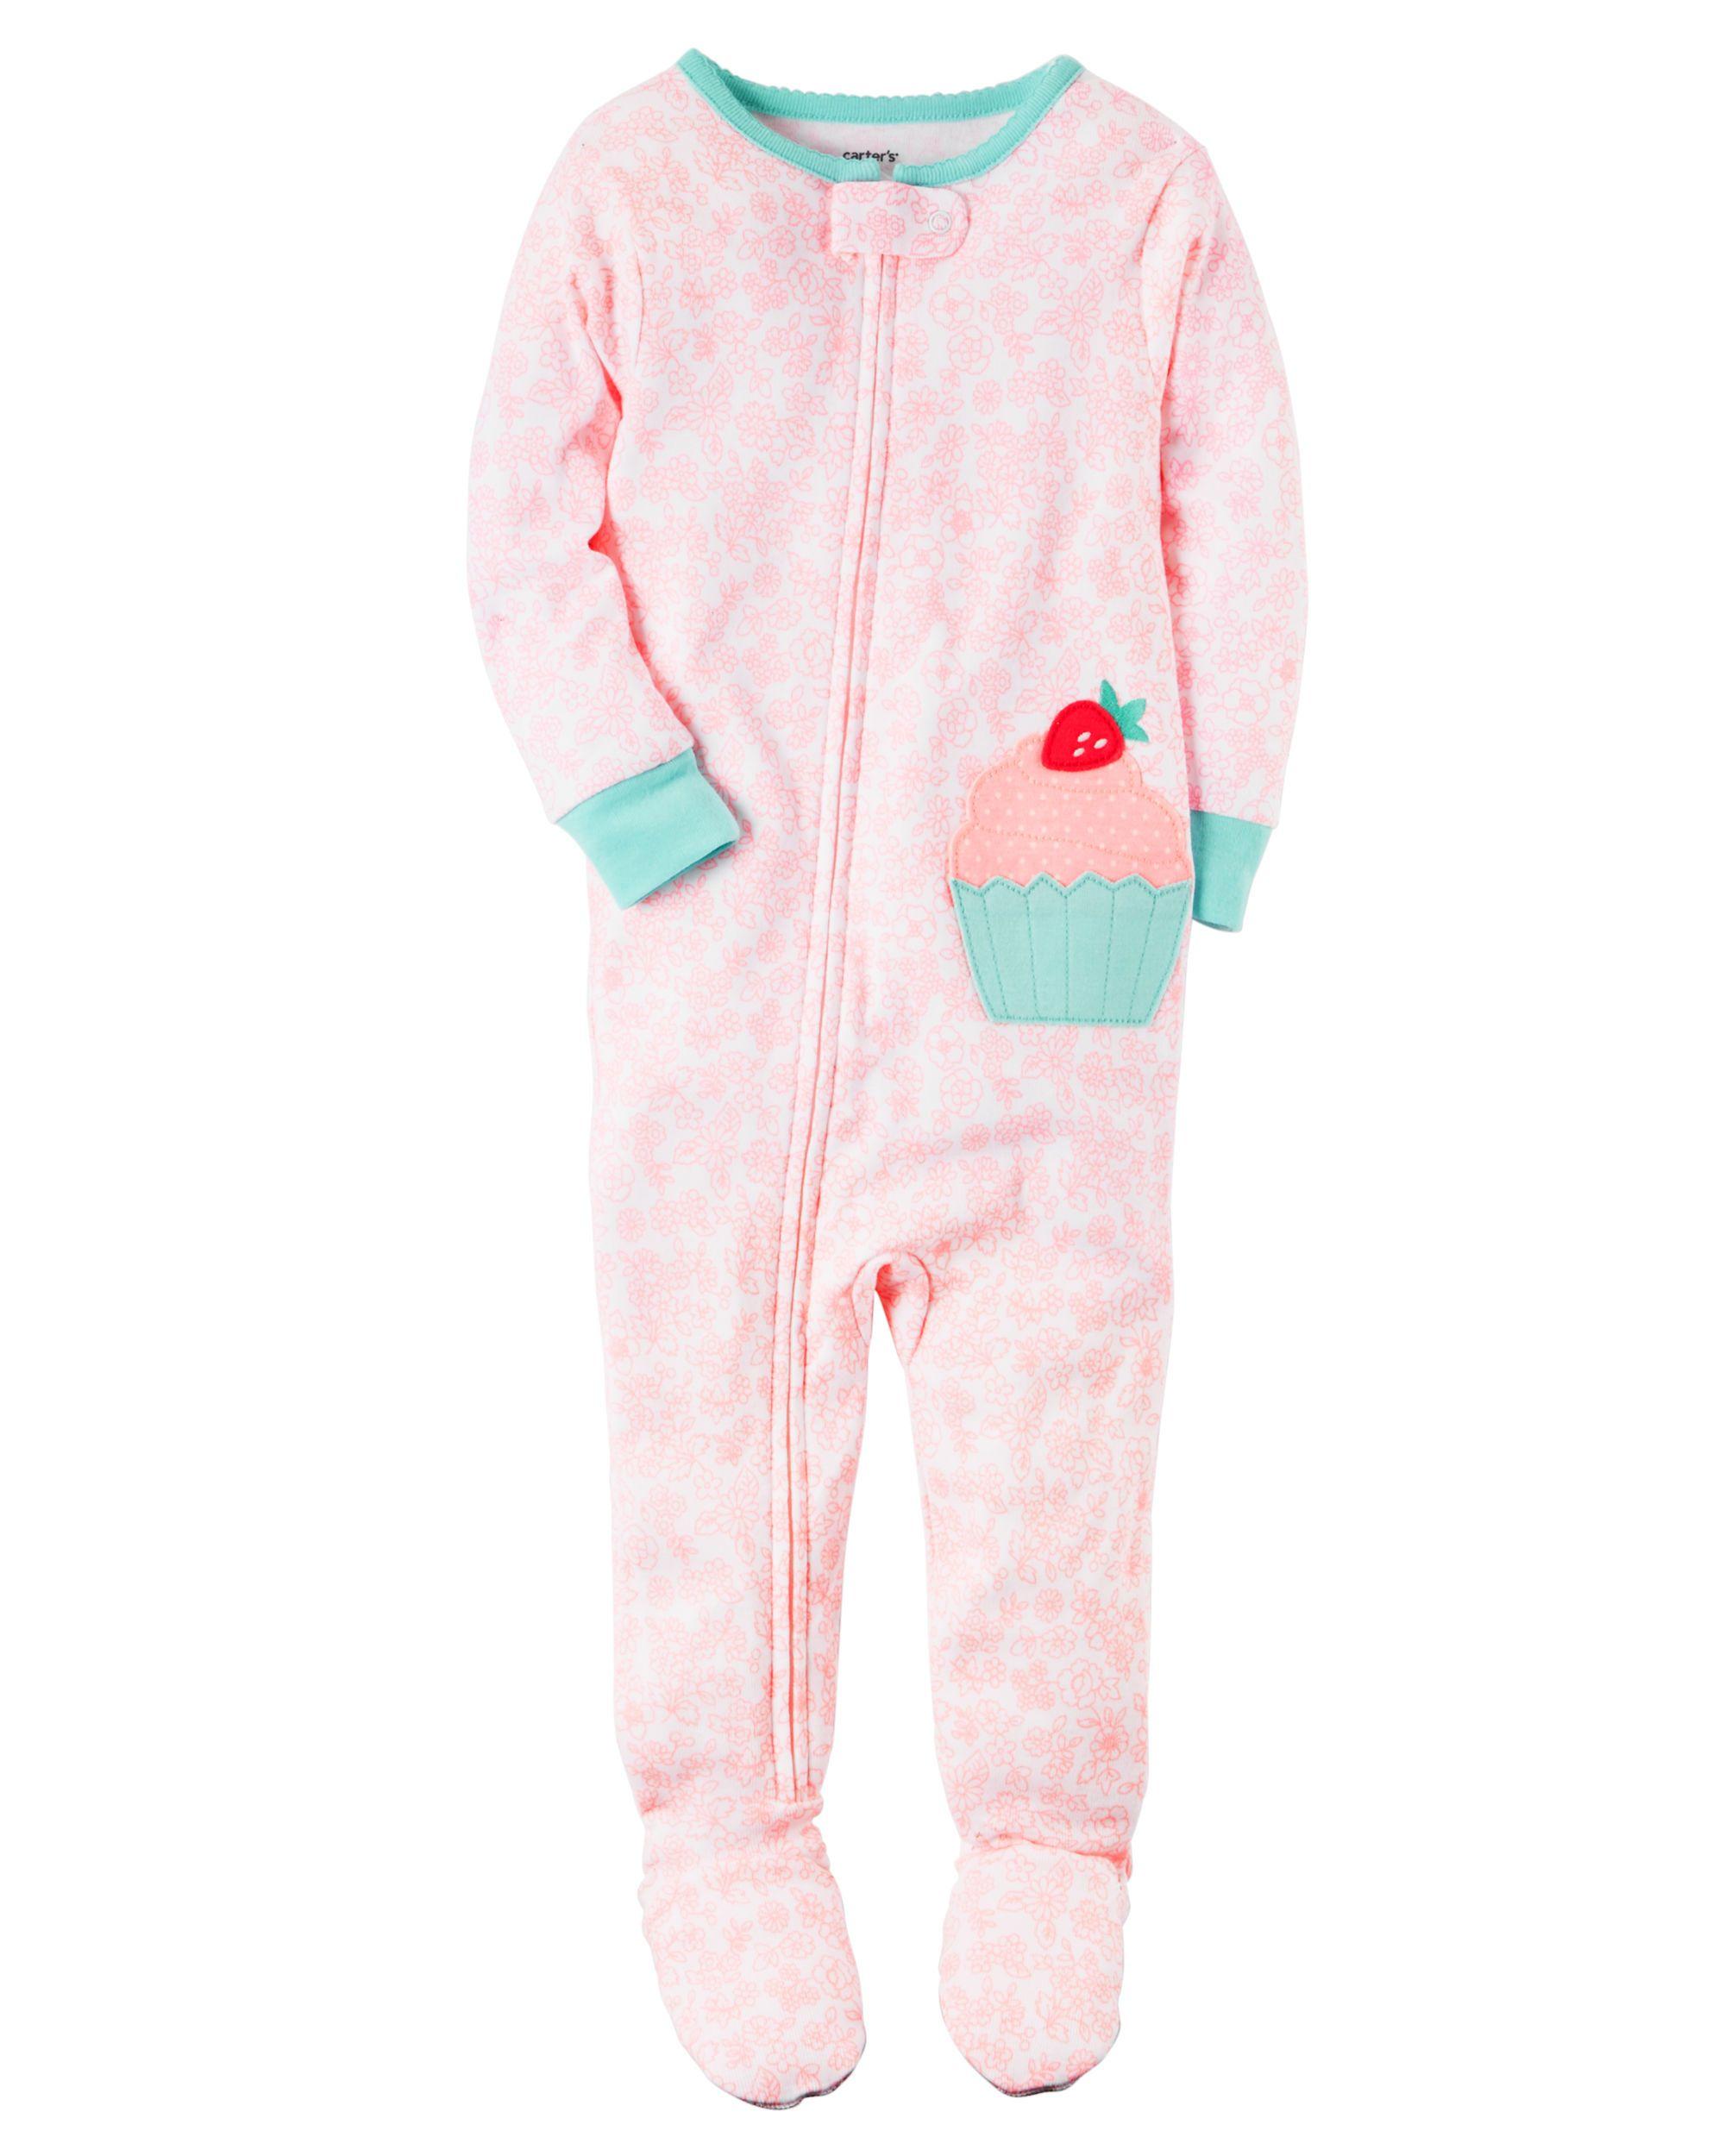 21b8b8743 1-Piece Snug Fit Cotton PJs